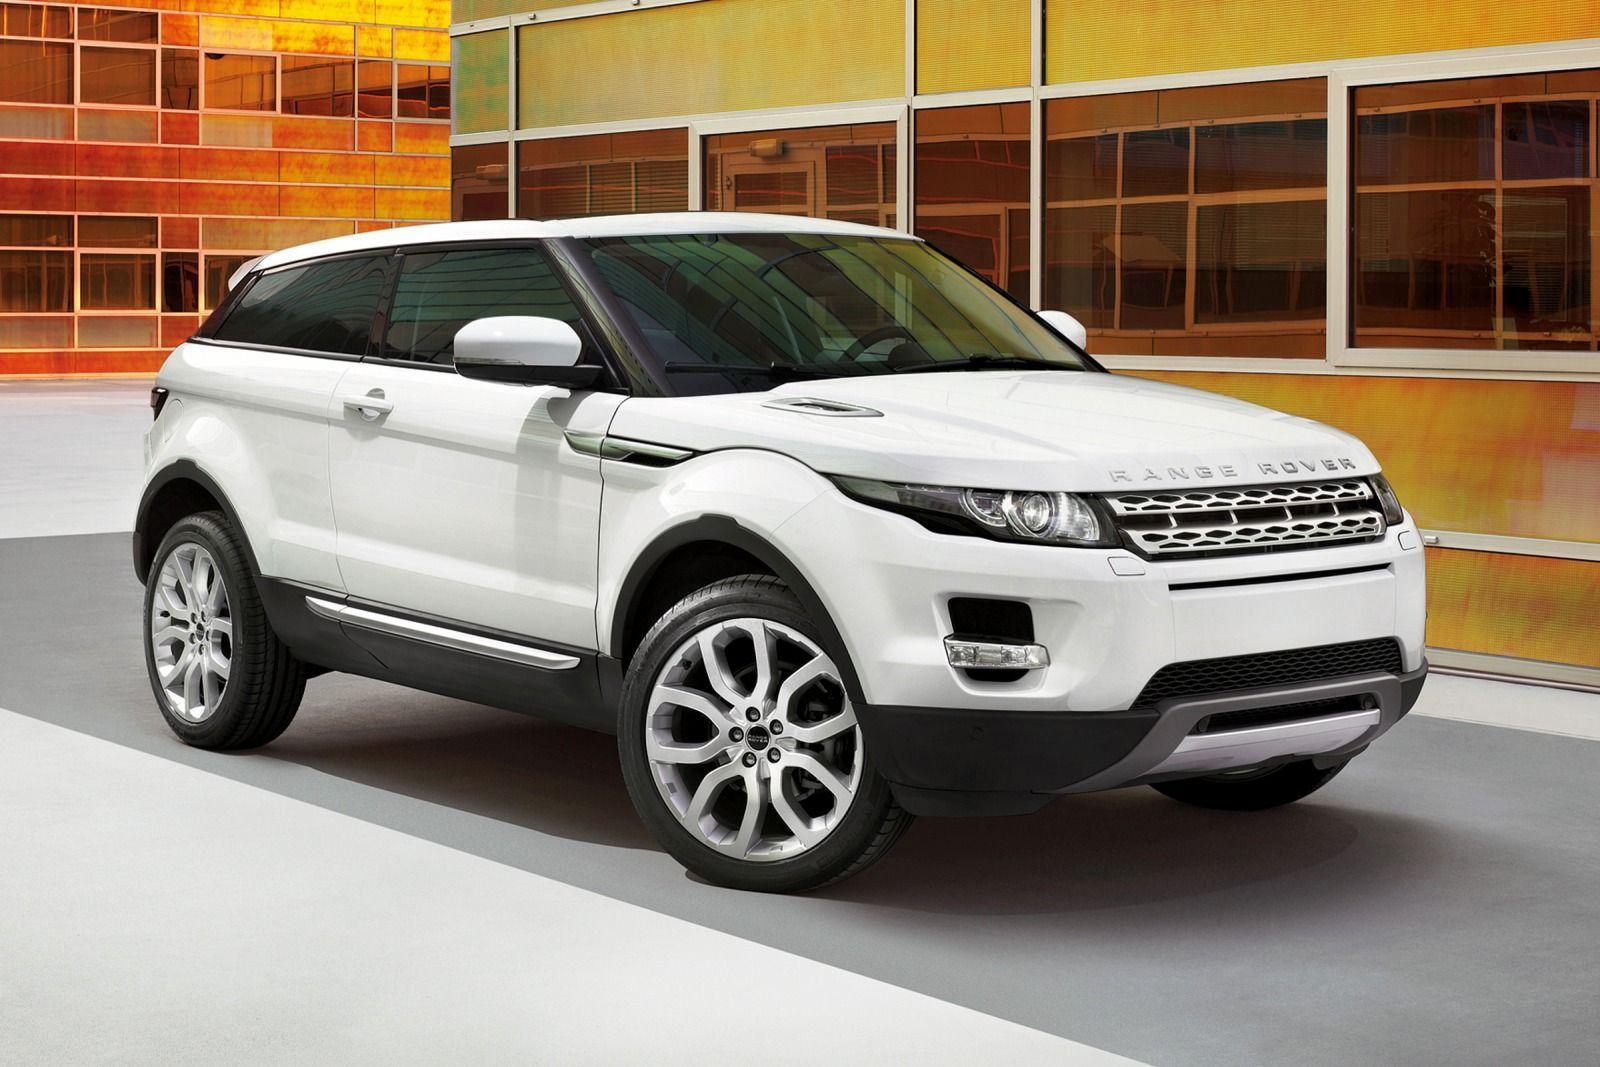 New Vehicle Inventory At Land Rover San Diego Holman Automotive Range Rover Evoque Range Rover Evoque Review Range Rover Evoque Coupe